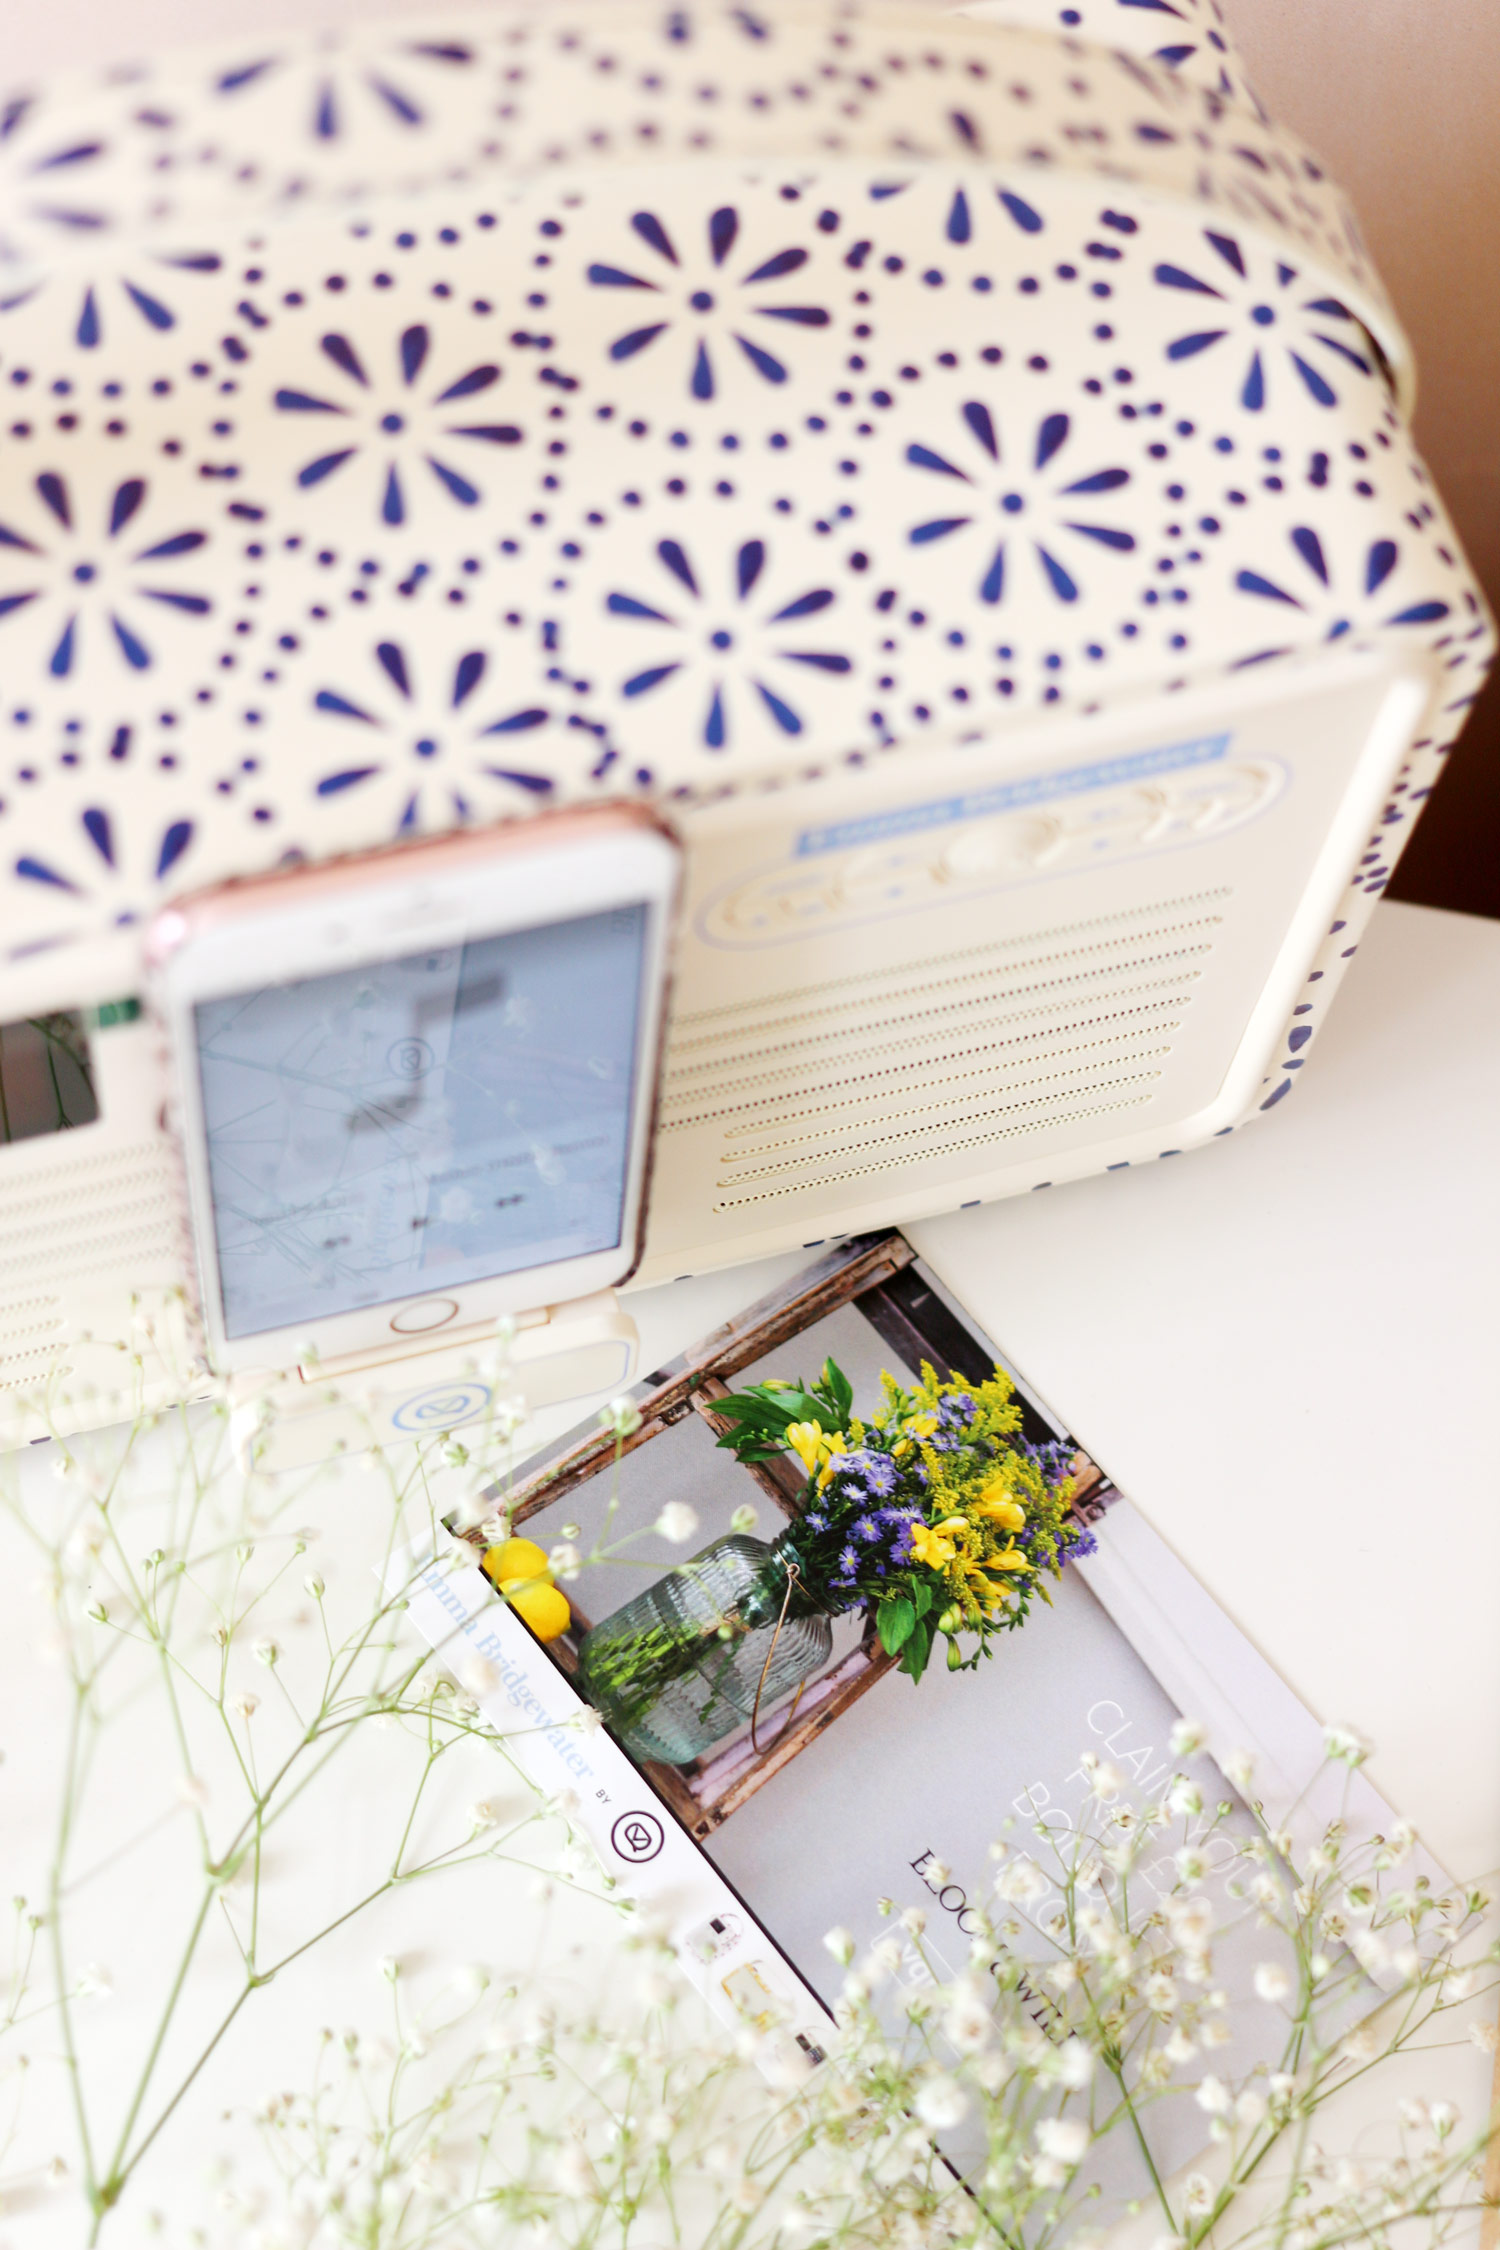 mothers-day-present-bloom-and-wild-emma-bridgewater-digital-radio-offer-2